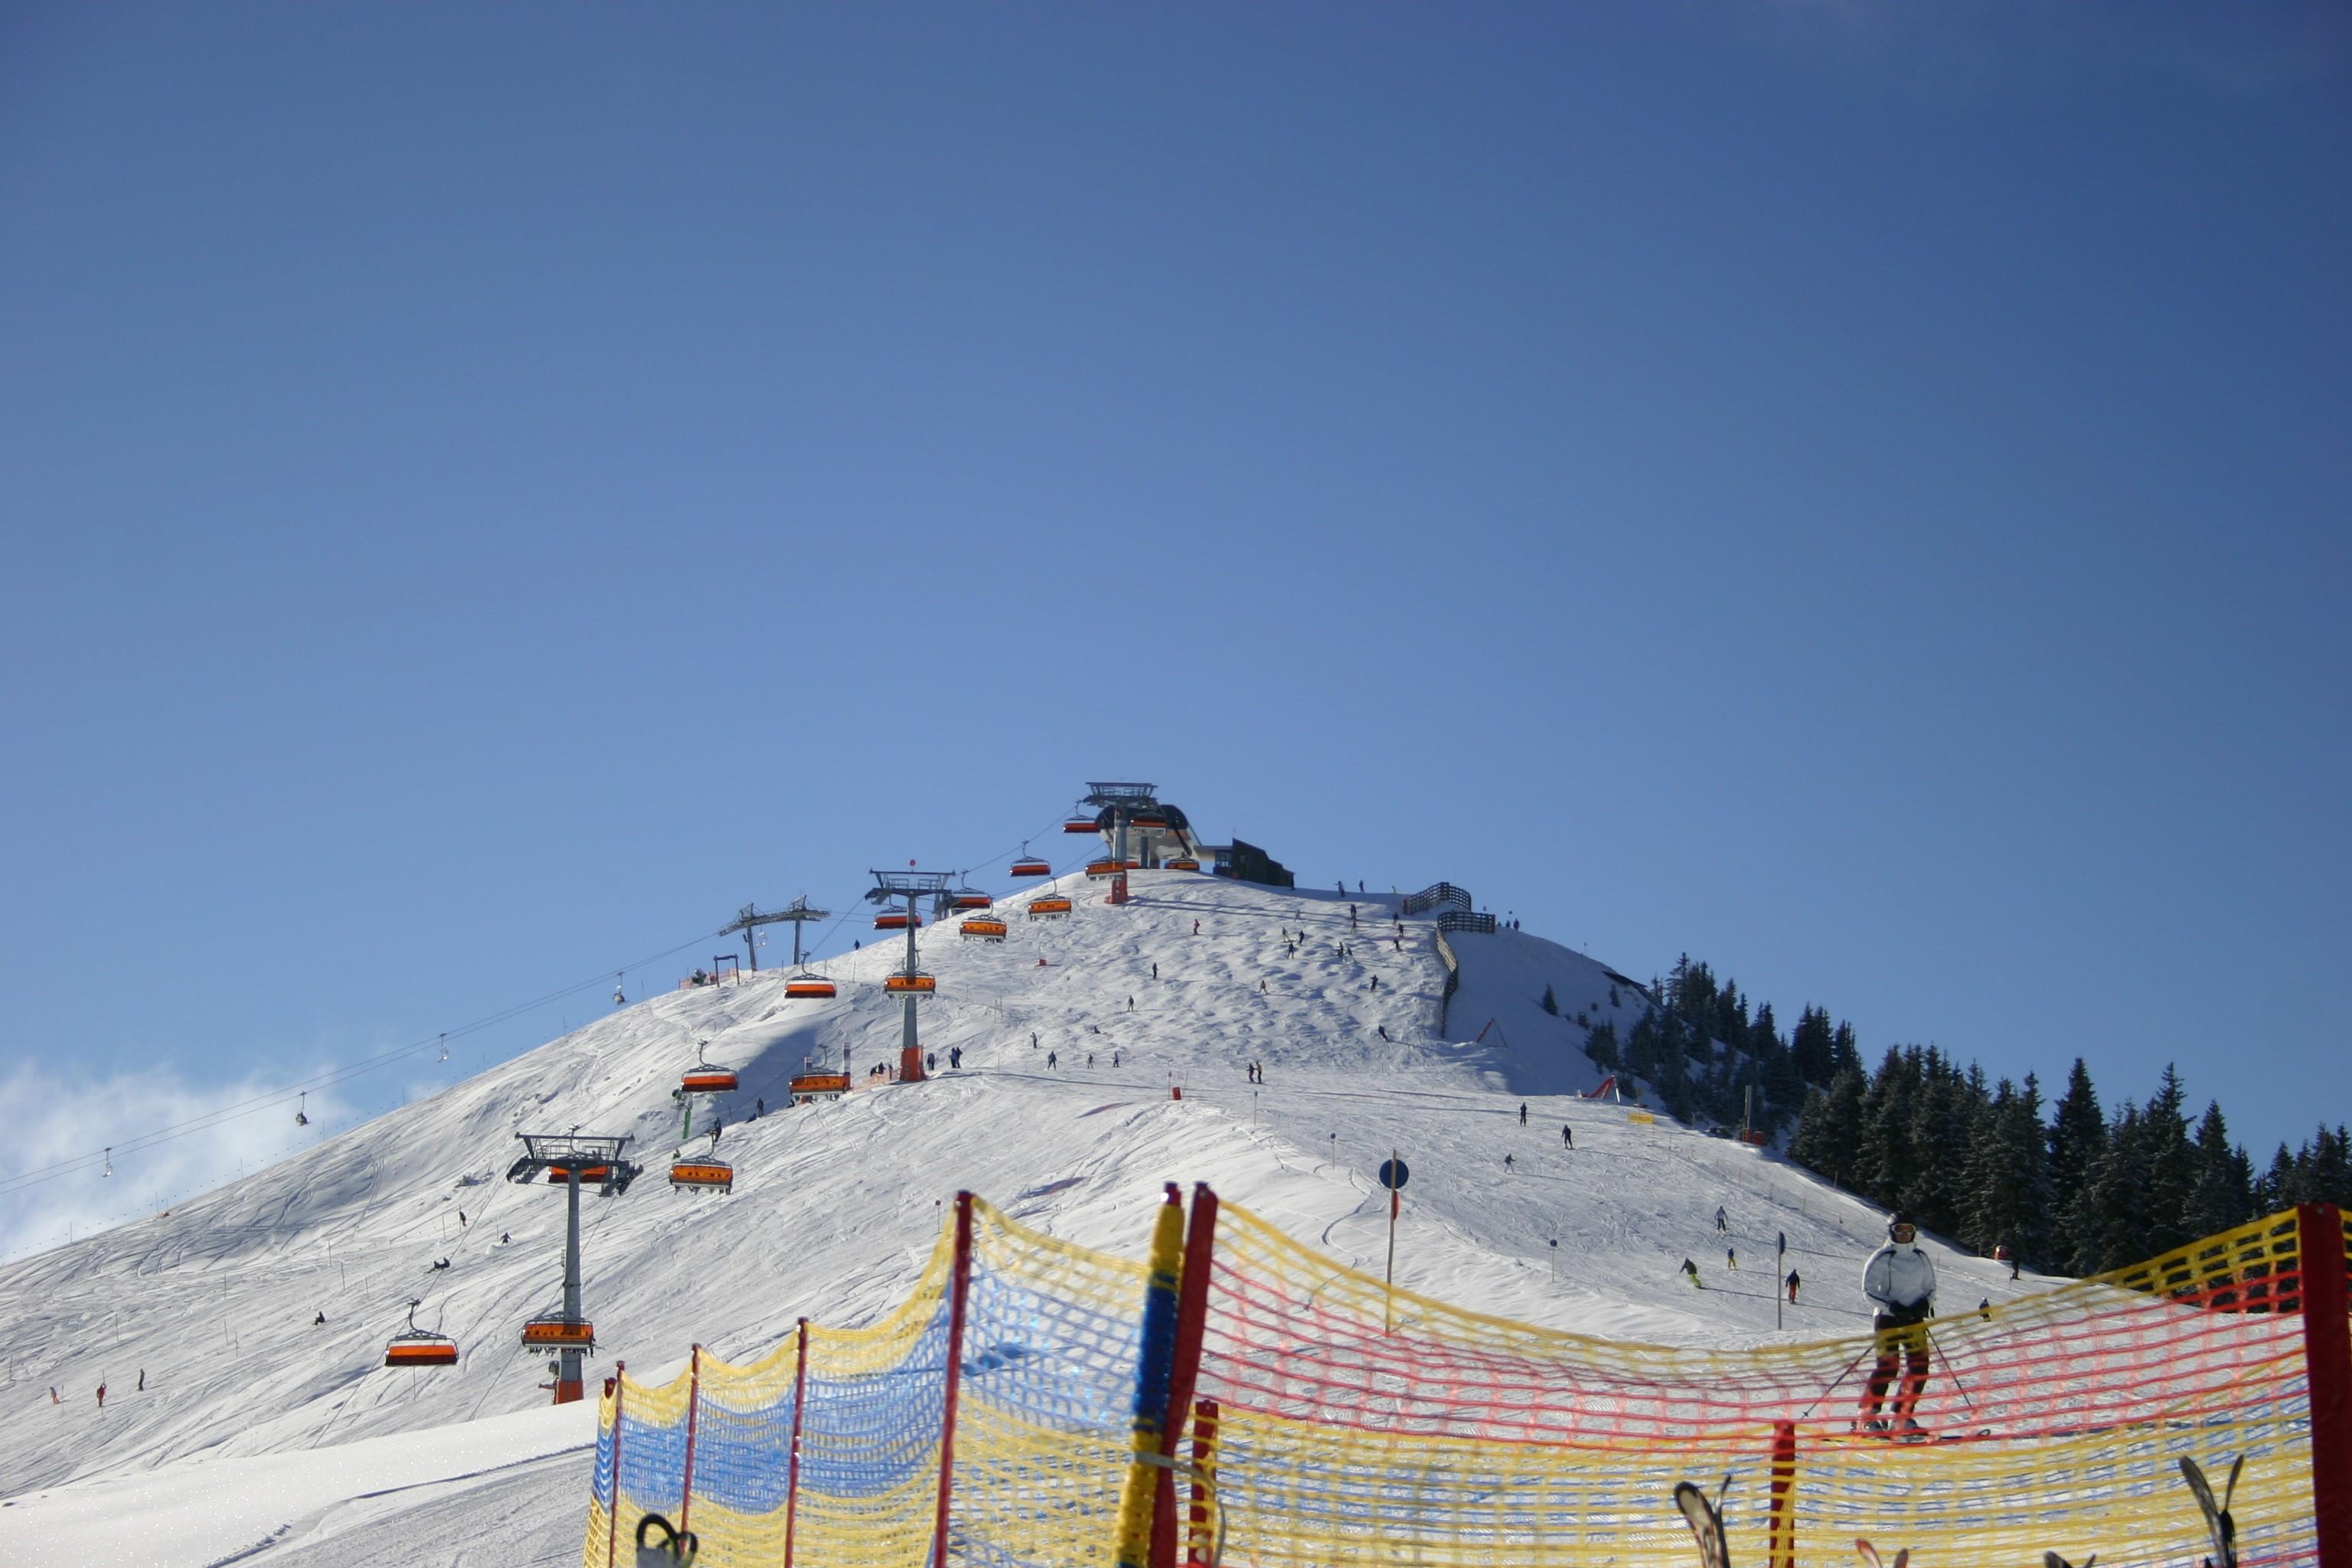 Skicircus Saalbach Hinterglemm Leogang 024 - Dag 1